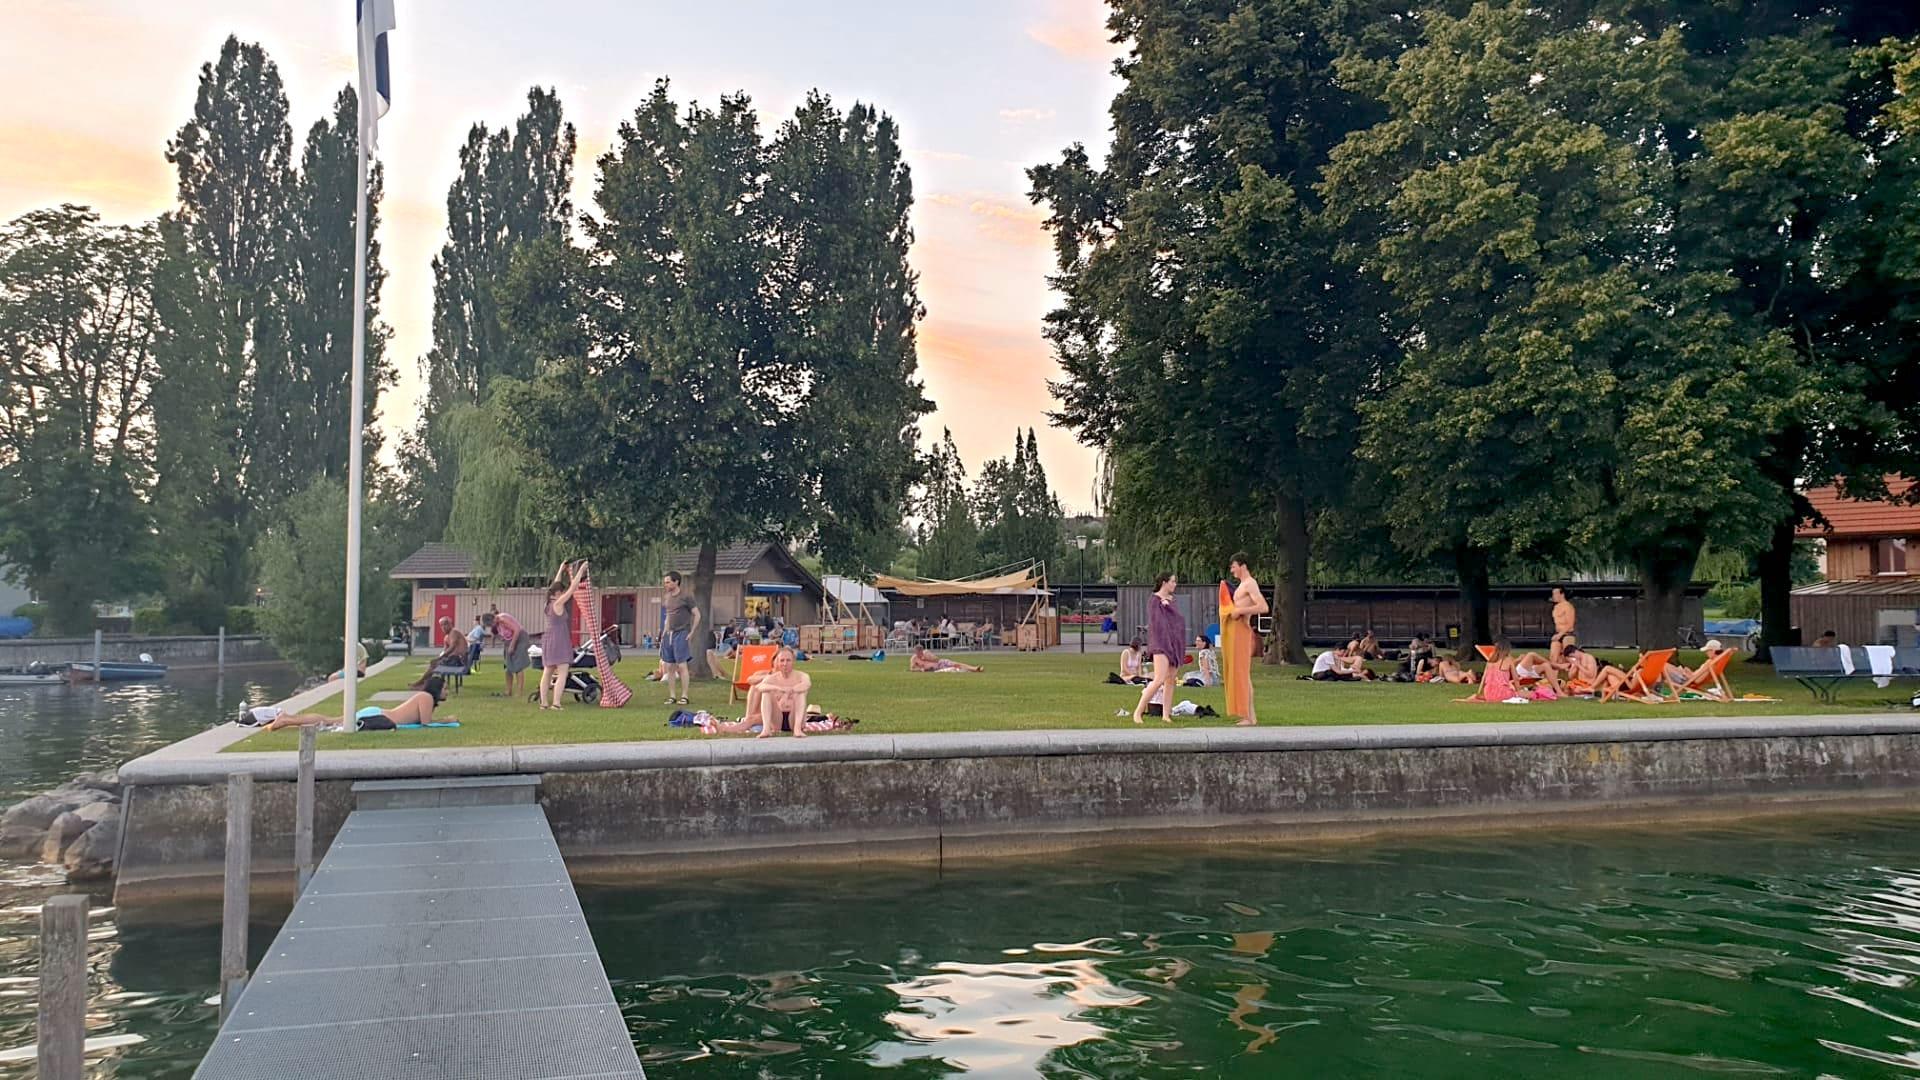 Ehemaliges Männerbad am Siehbach in Zug.